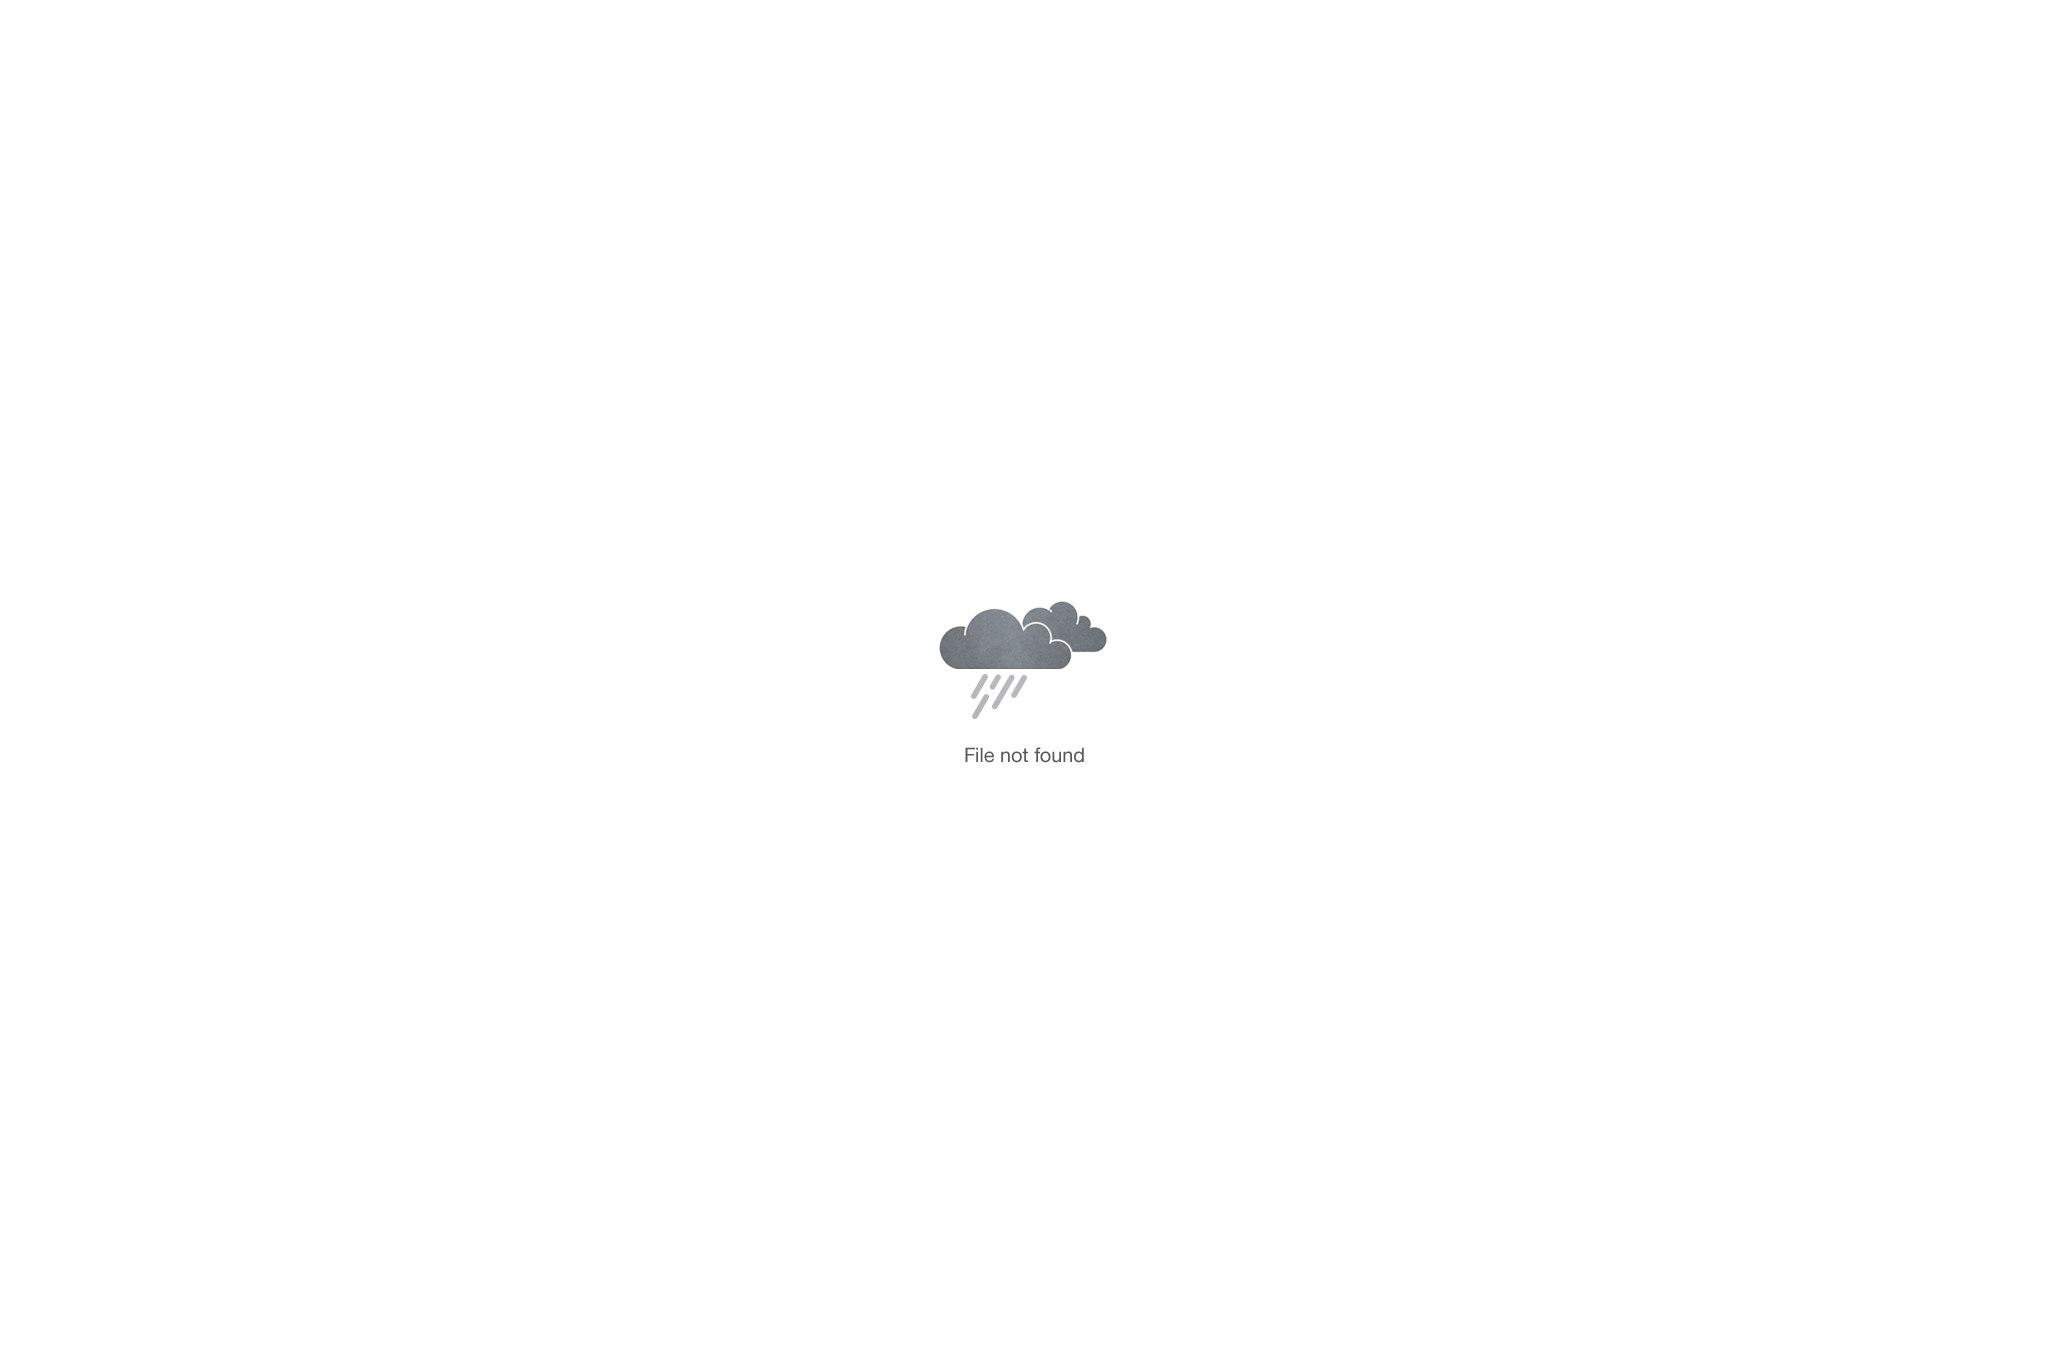 Arthur-Bosseboeuf-Rugby-Sponsorise-me-image-1